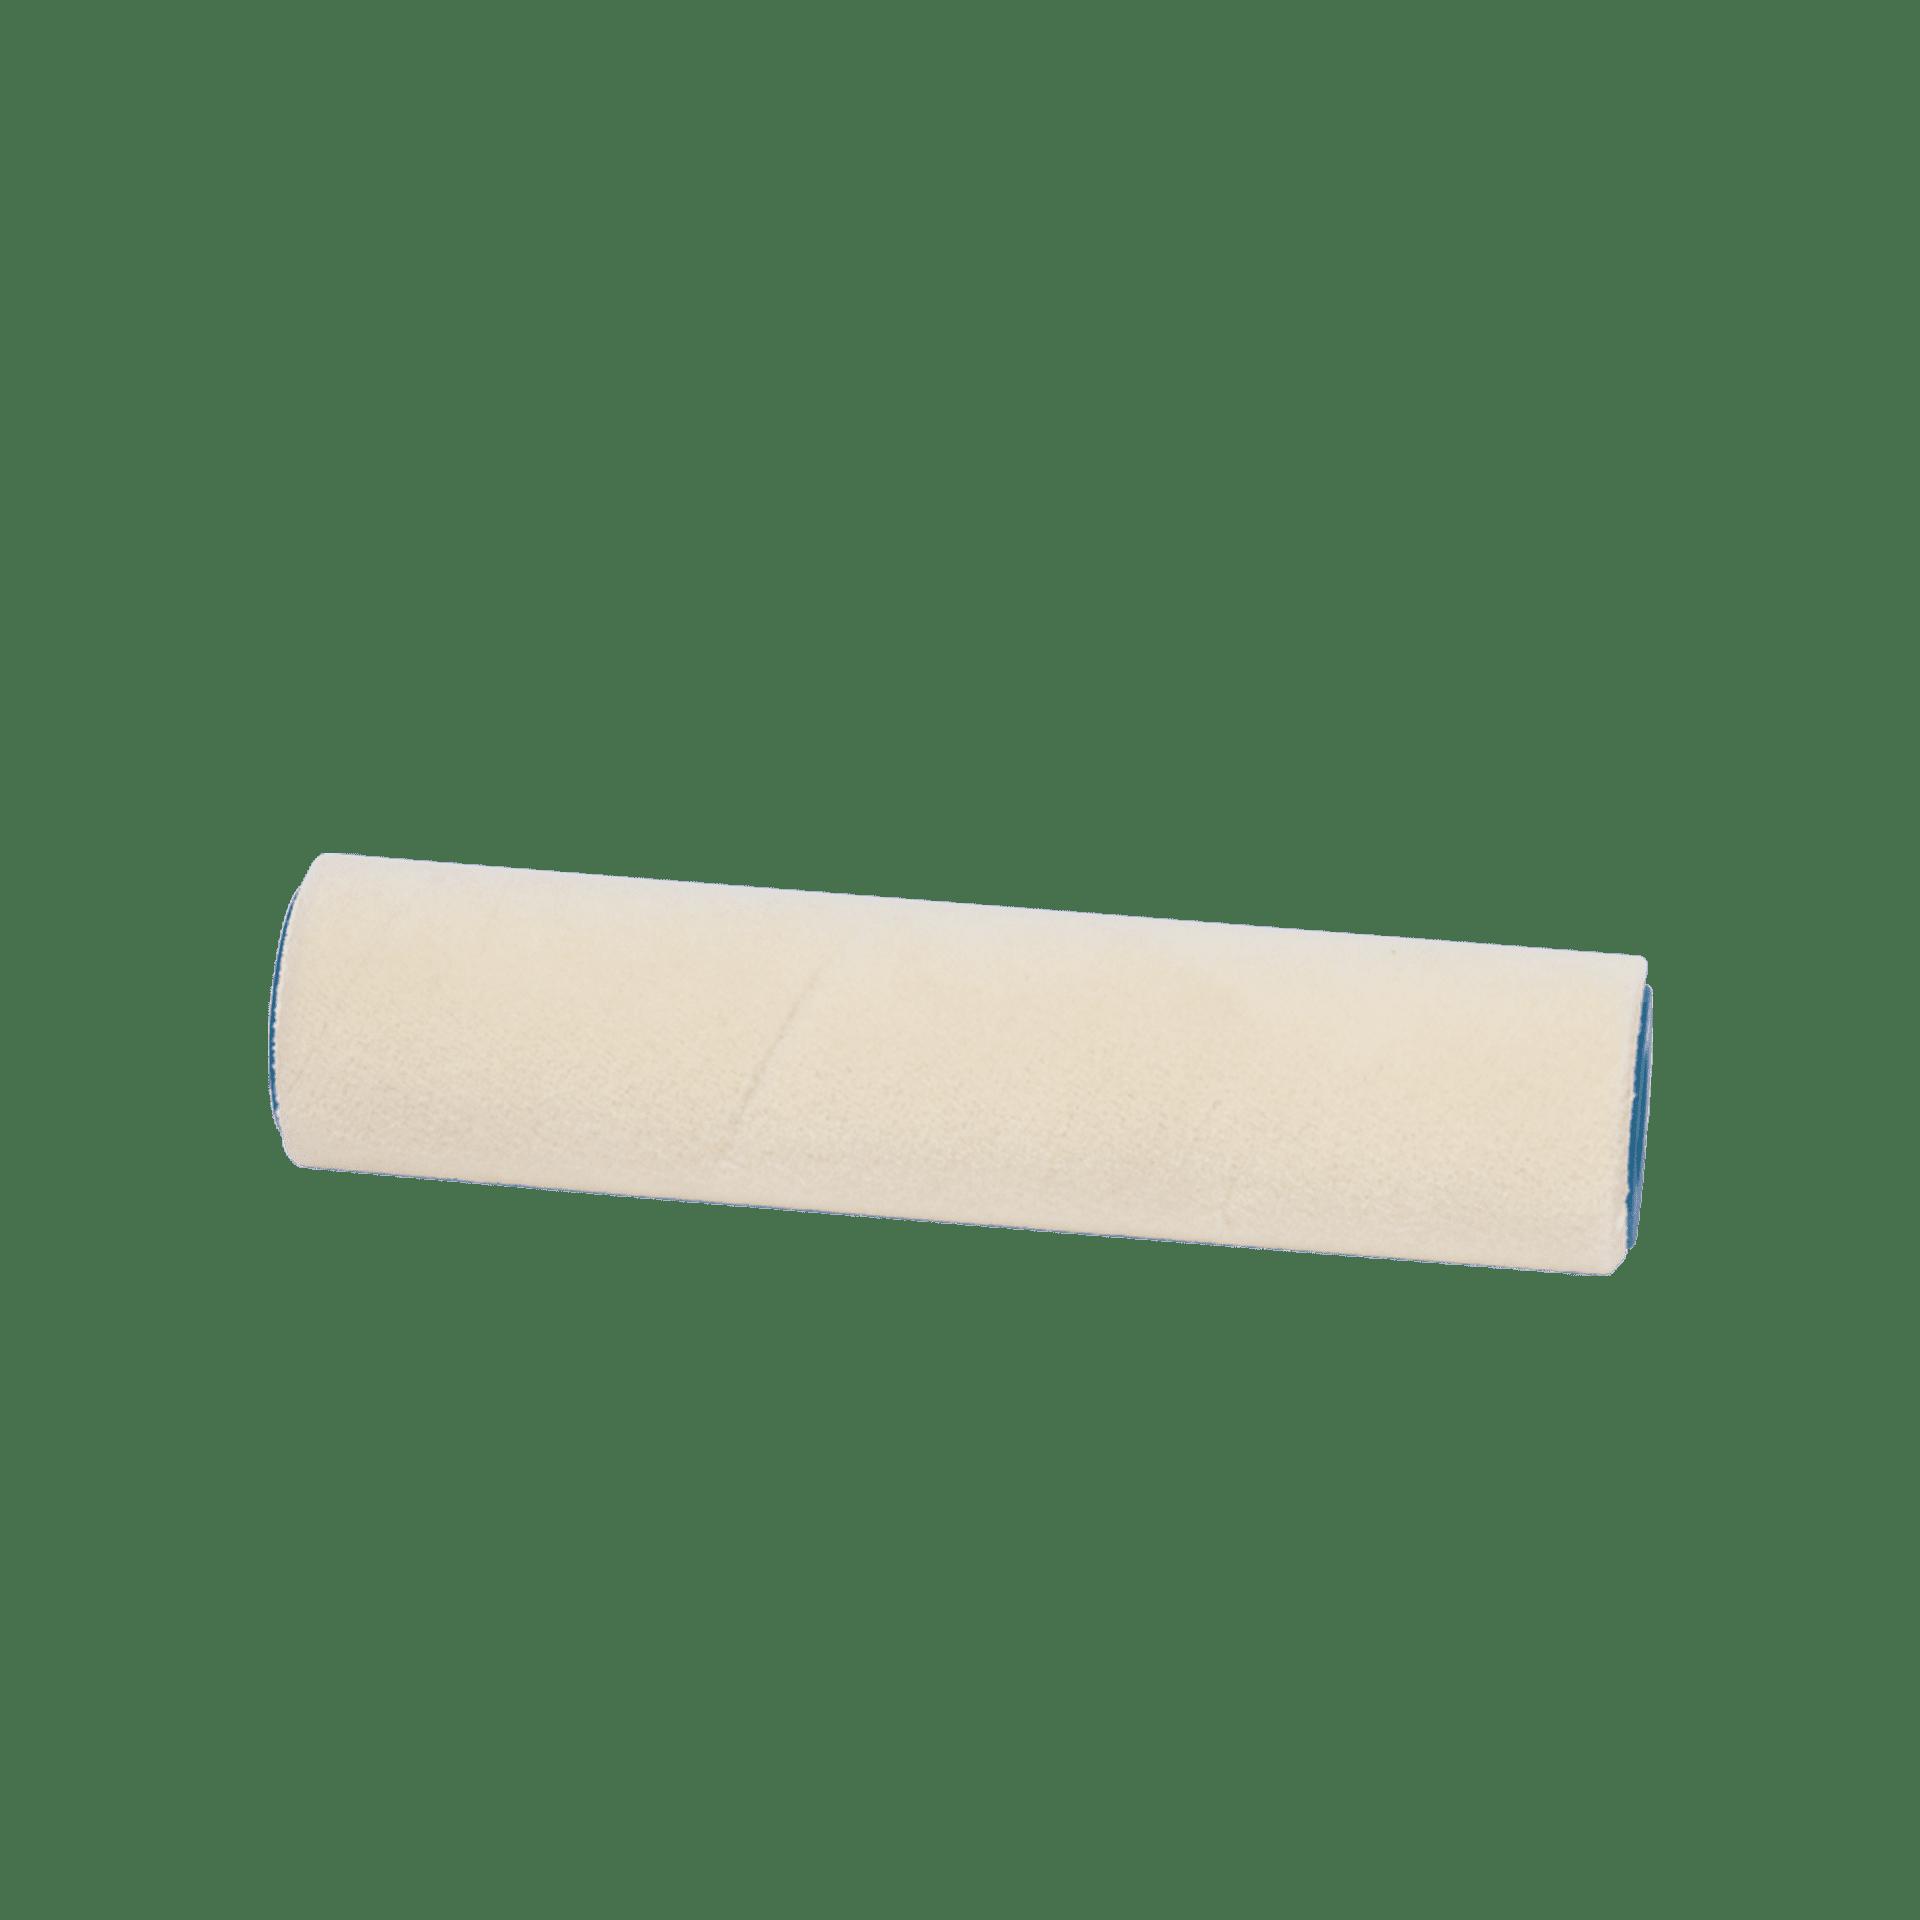 0950013-Öl-Wachs-Rolle